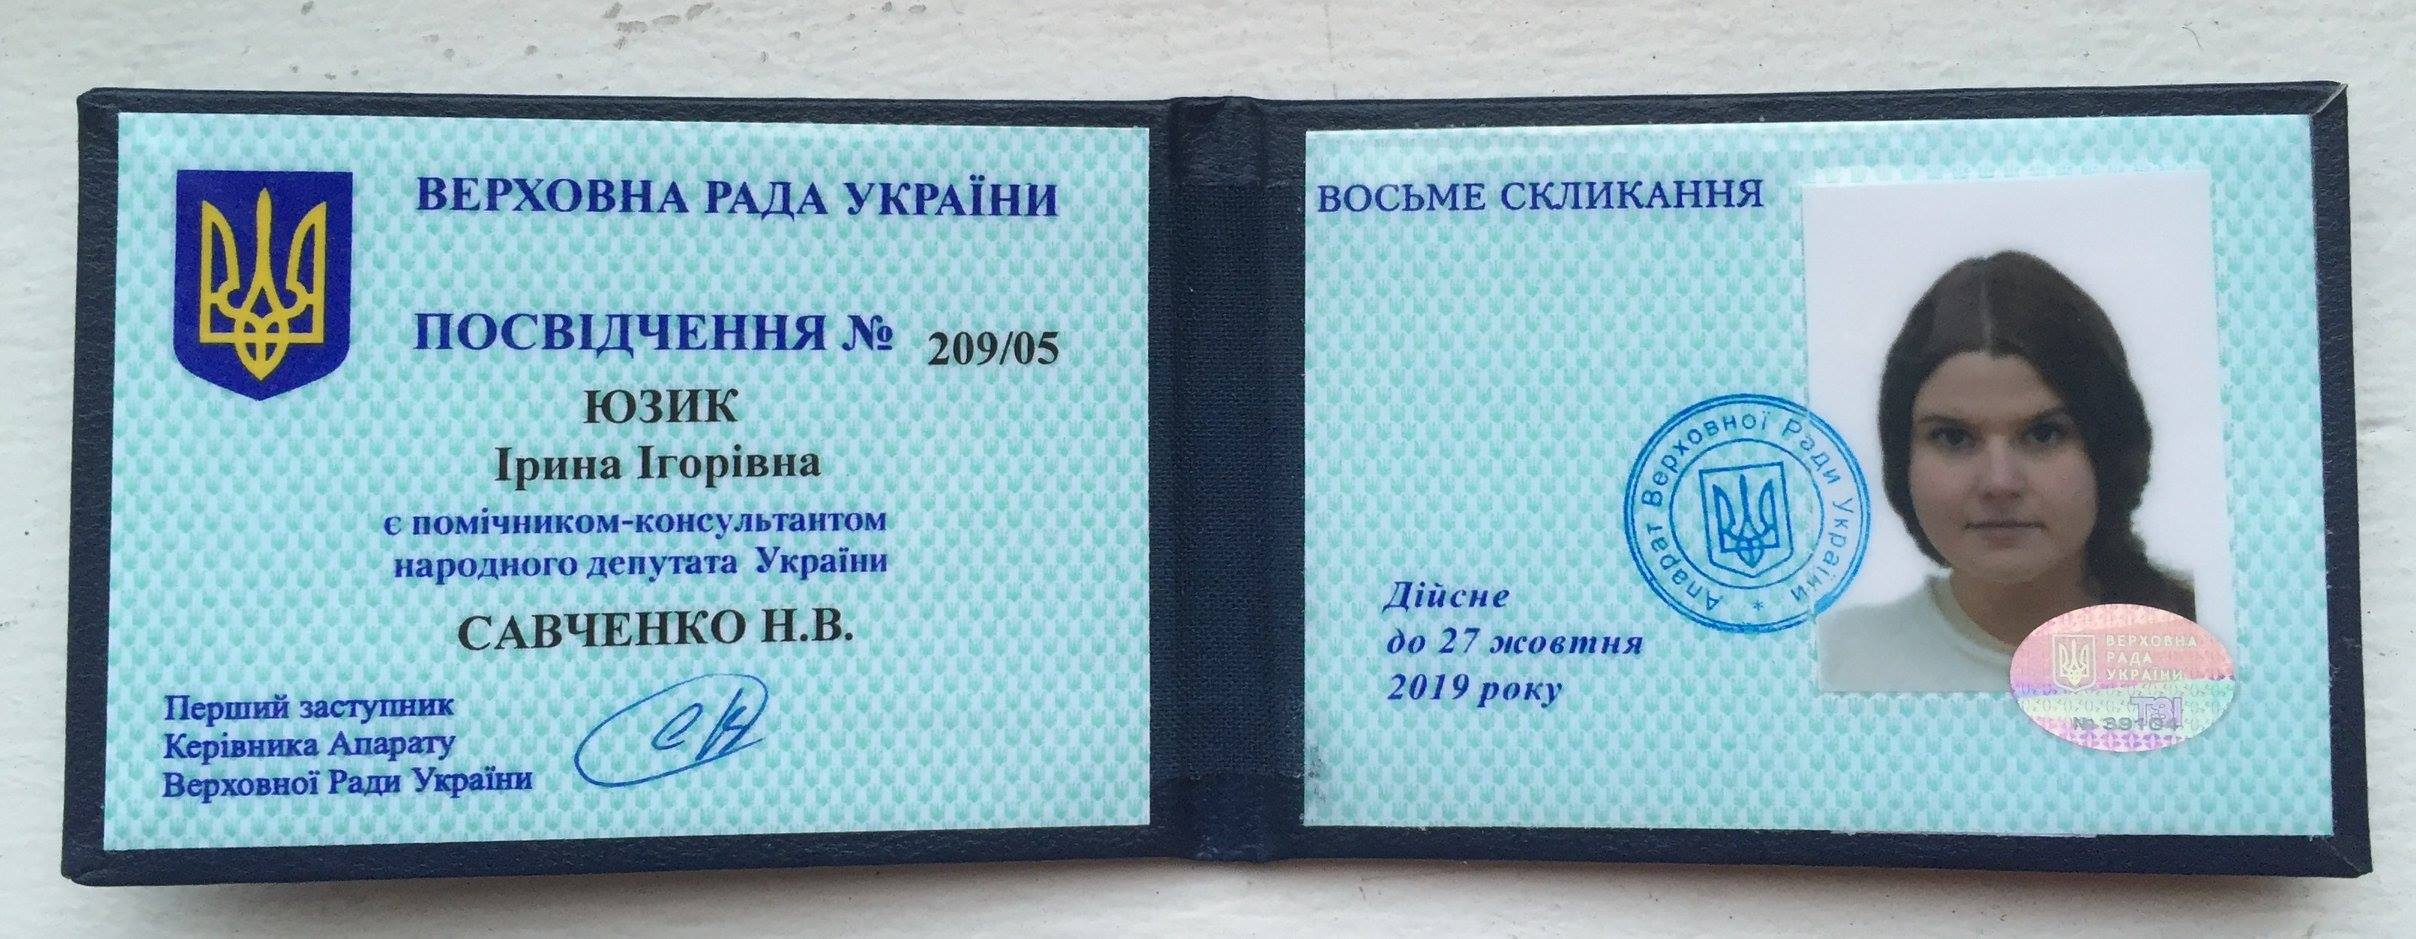 Савченко зробила подружку помічником депутата - фото 1